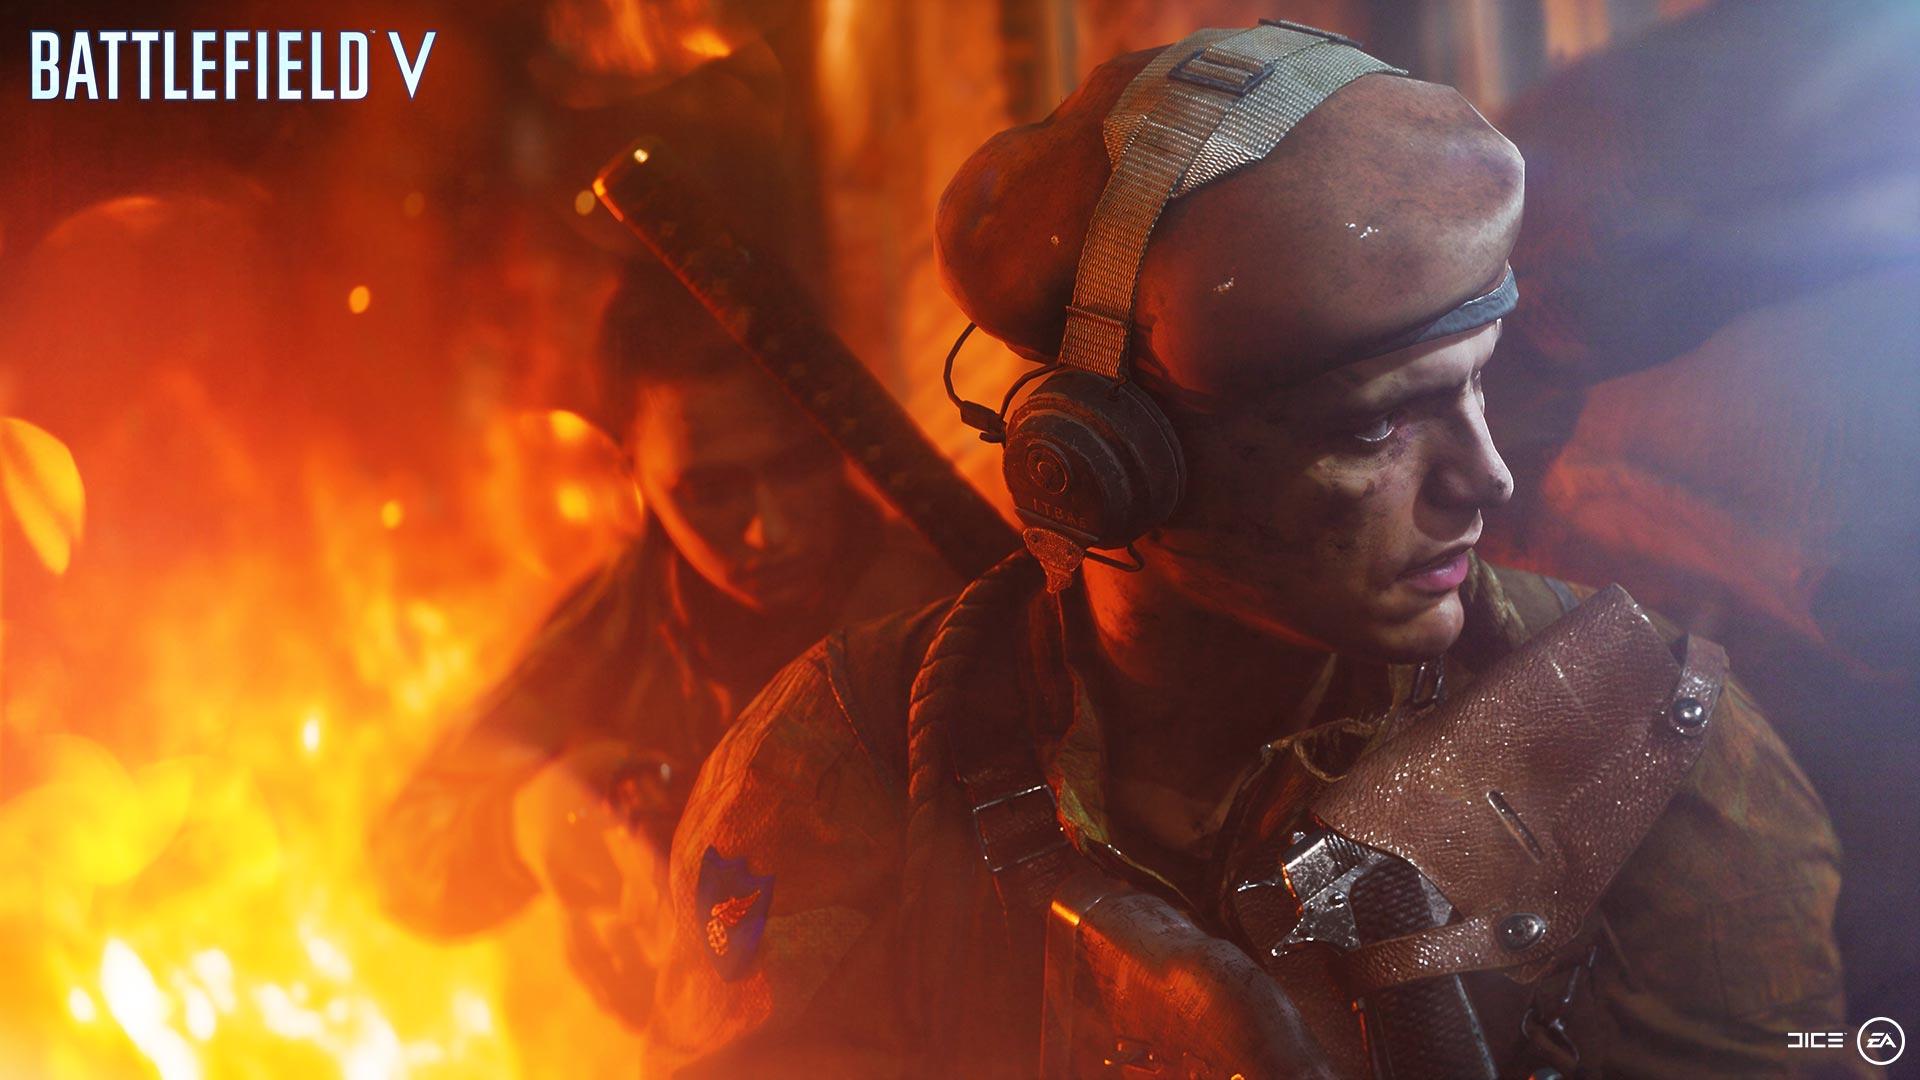 Battlefield 5: Closed Alpha but public